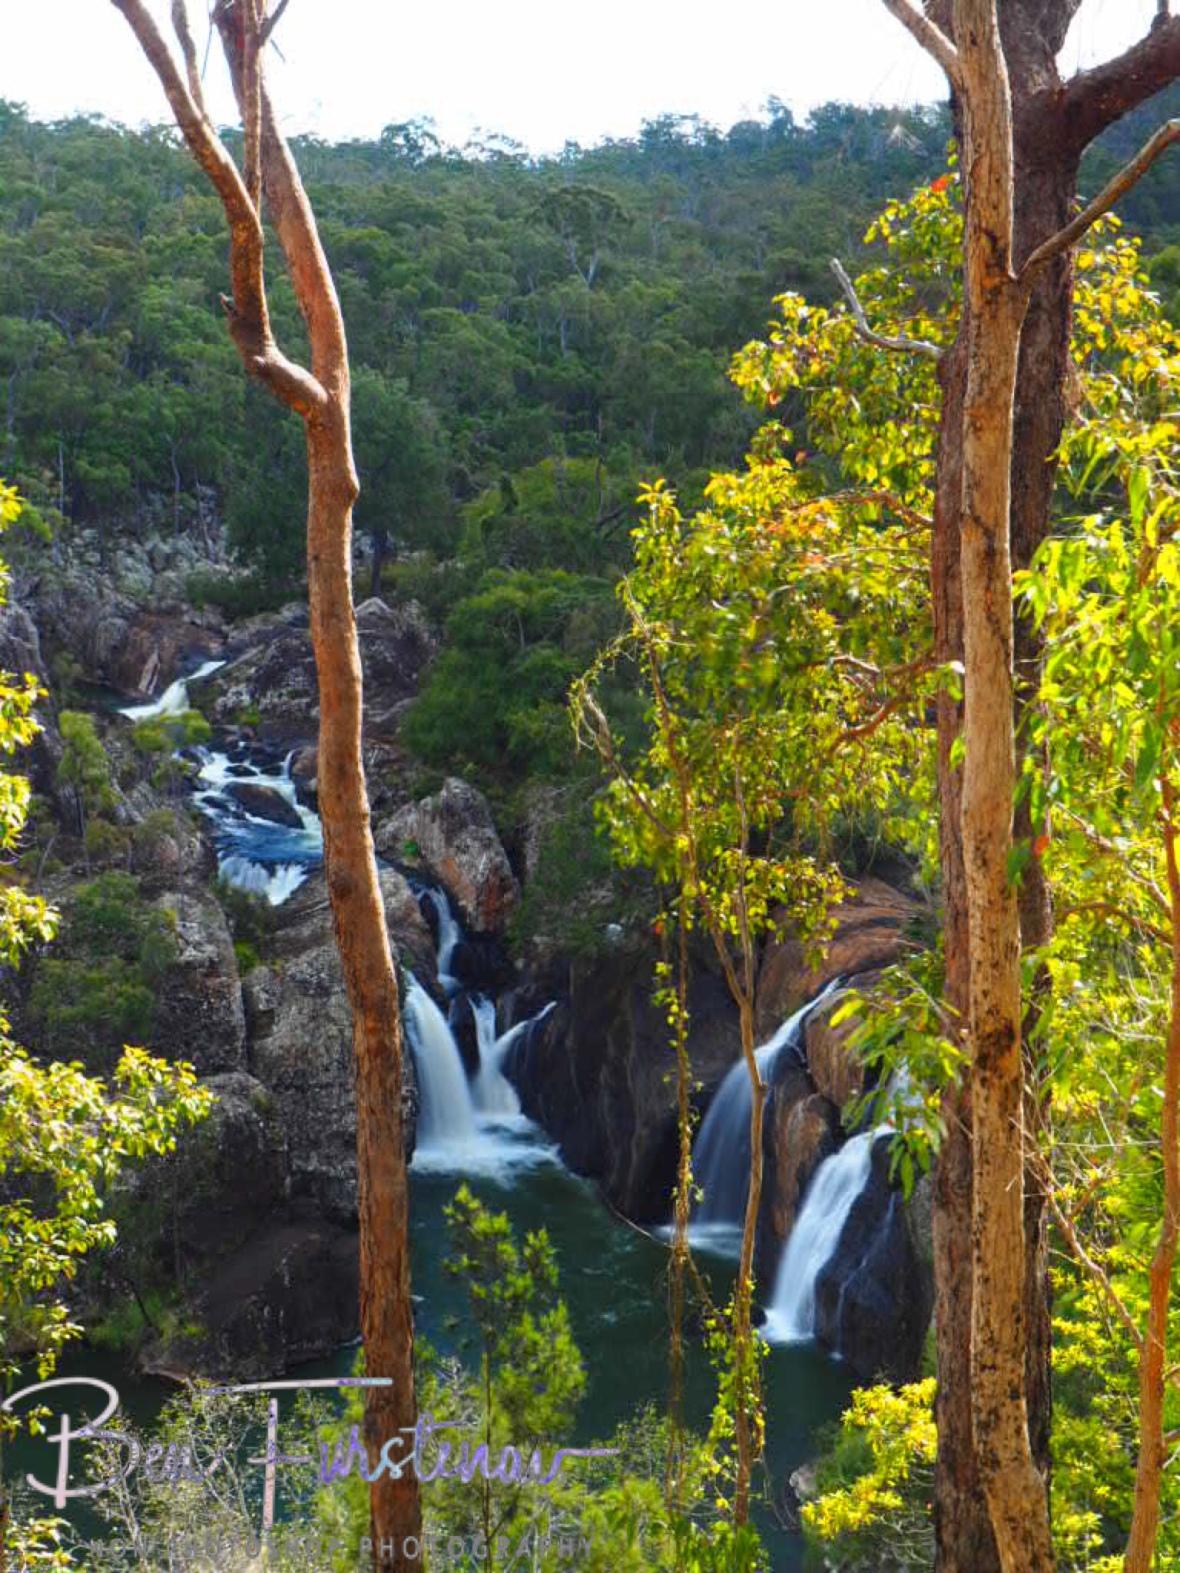 Eucalyptus Forest Overview, Atherton Tablelands, Far North Queensland, Australia